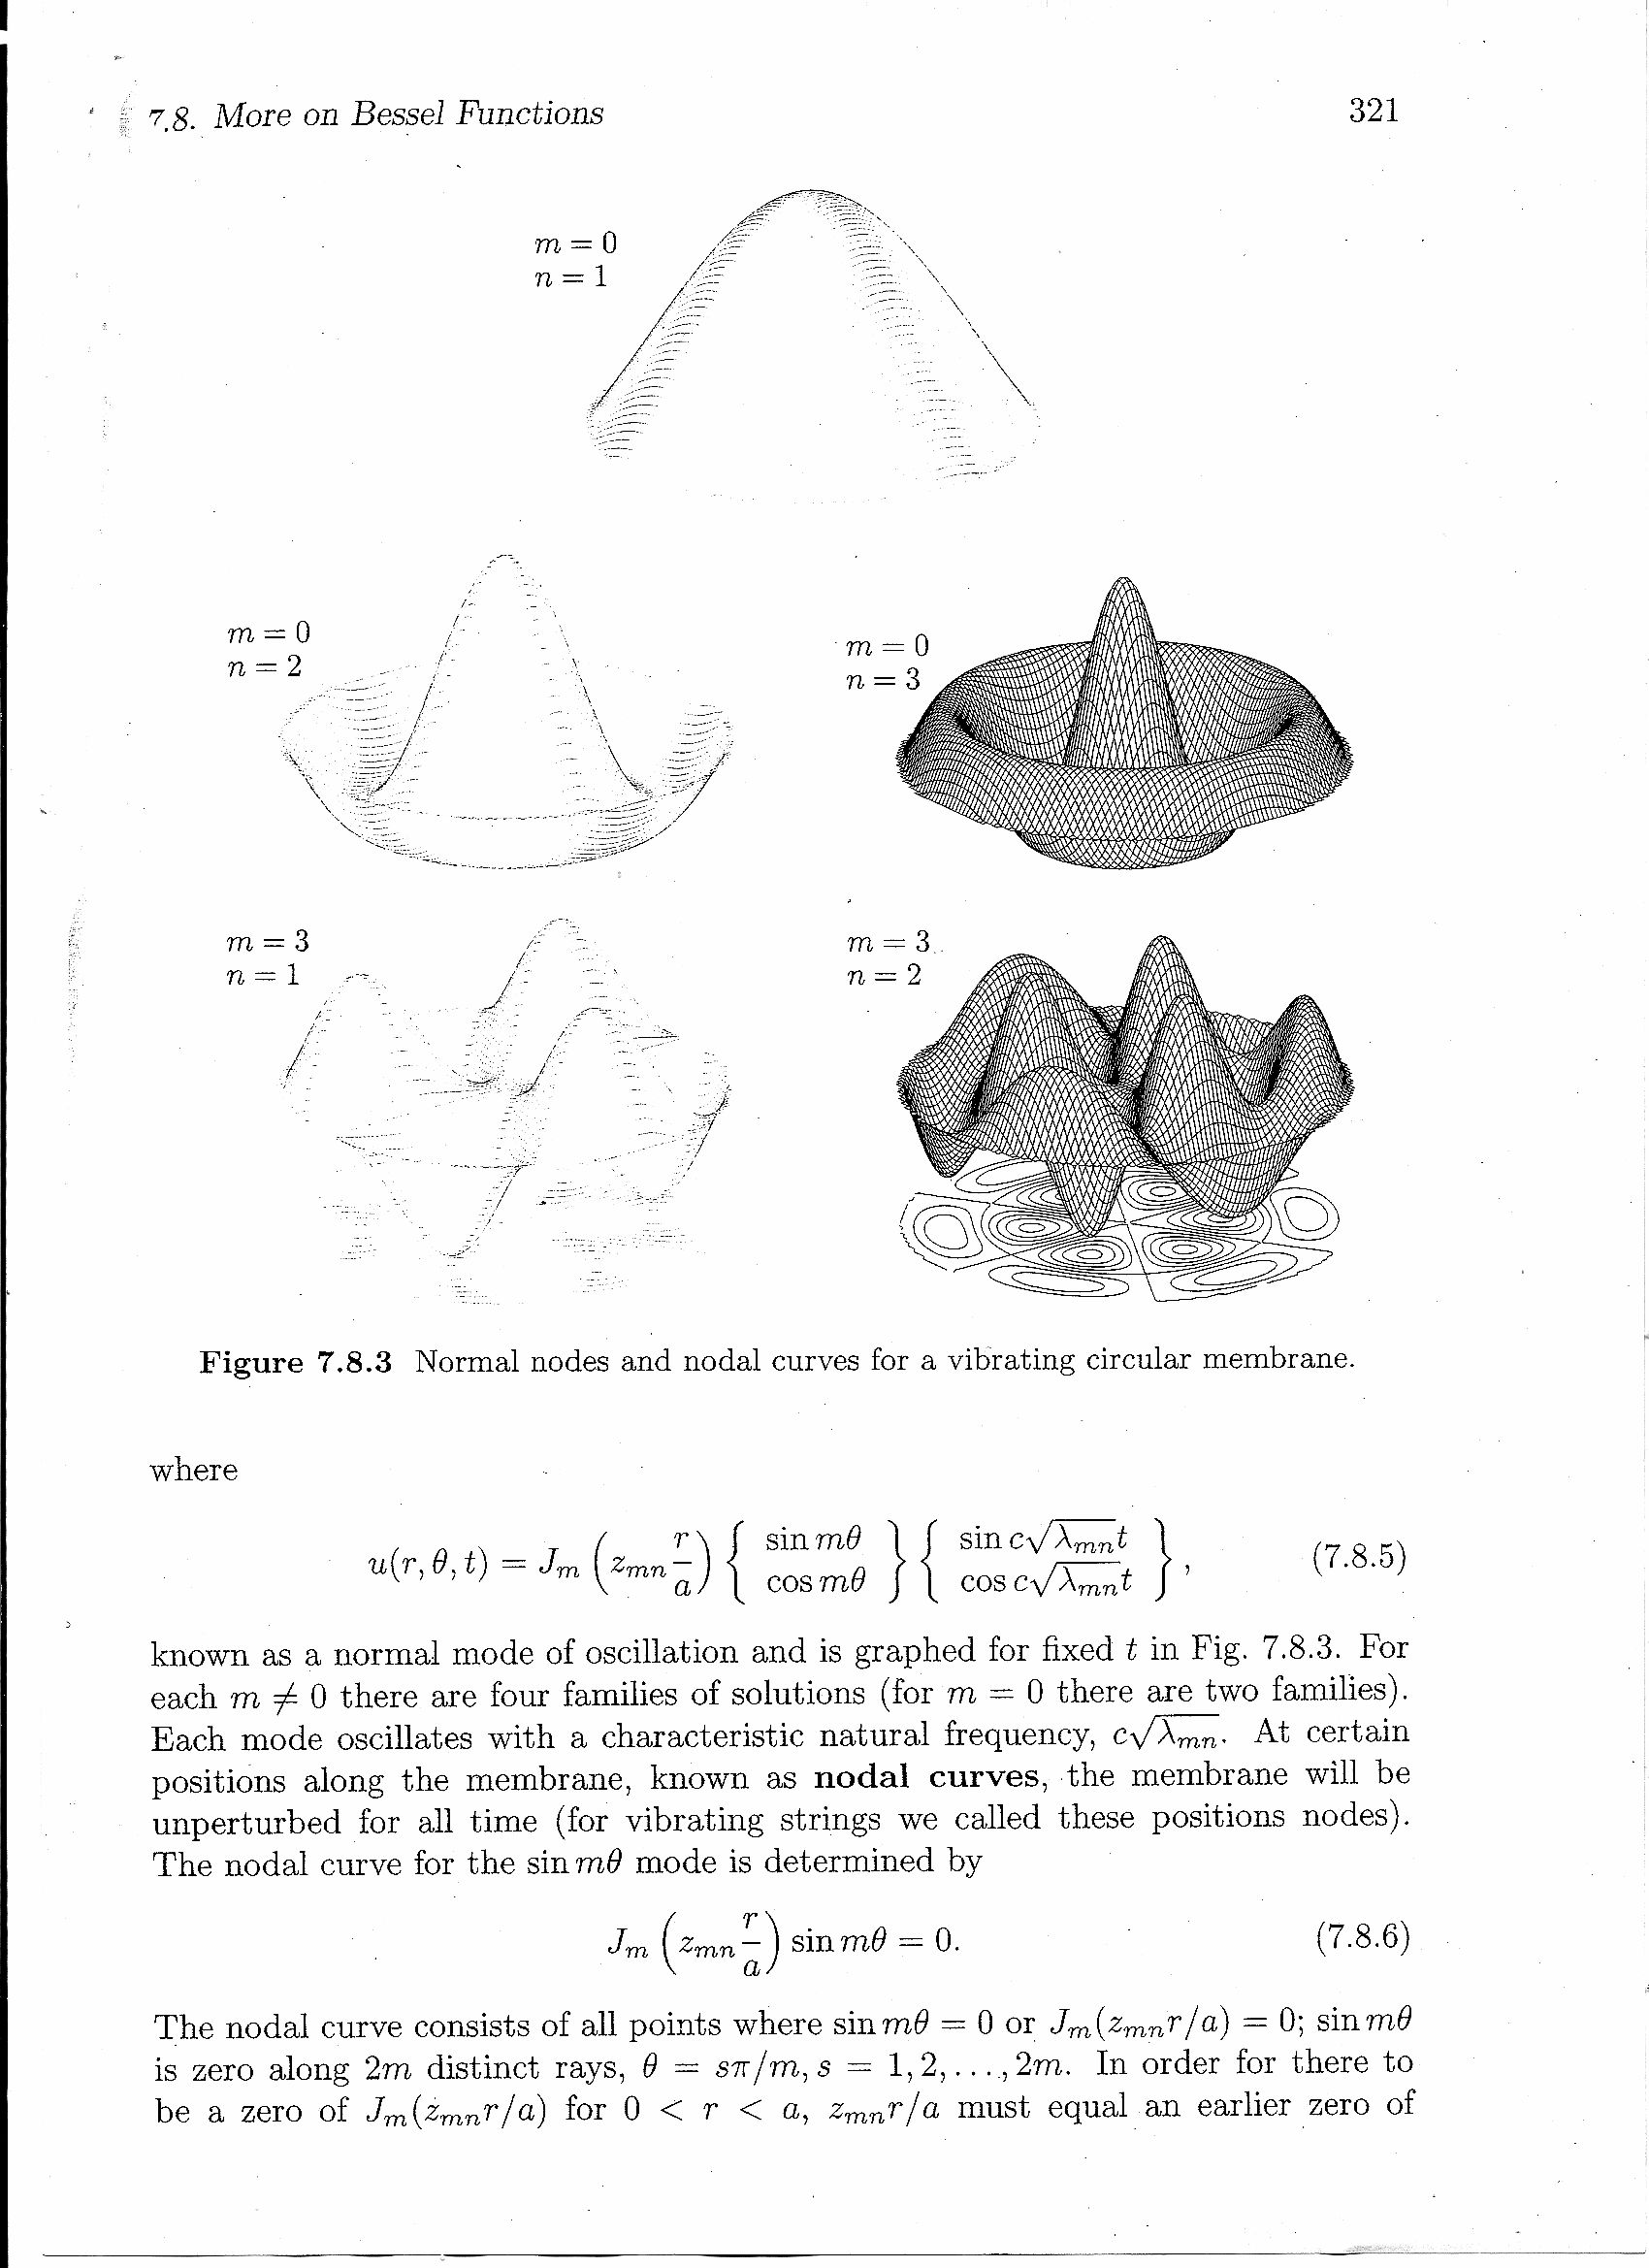 Black and decker instructions manuals